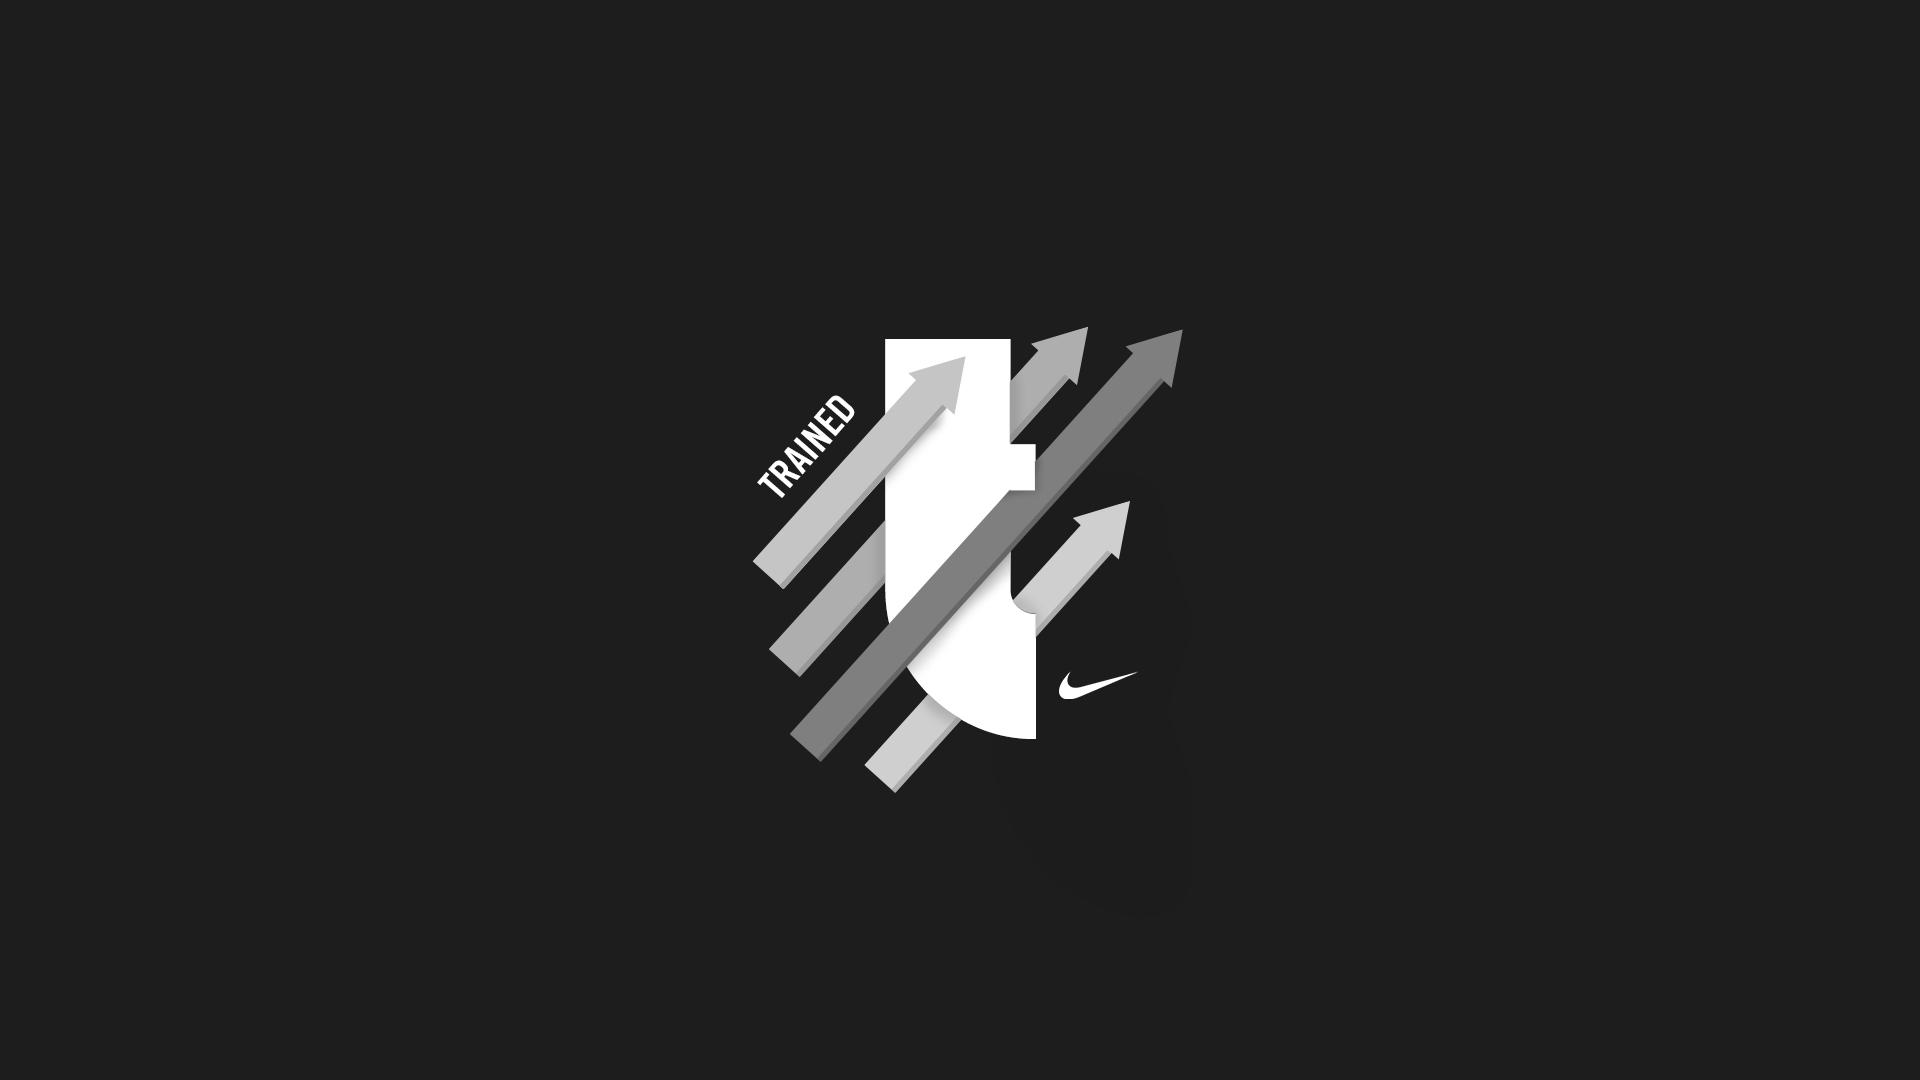 Shiels_site_logos_v1_1.jpg